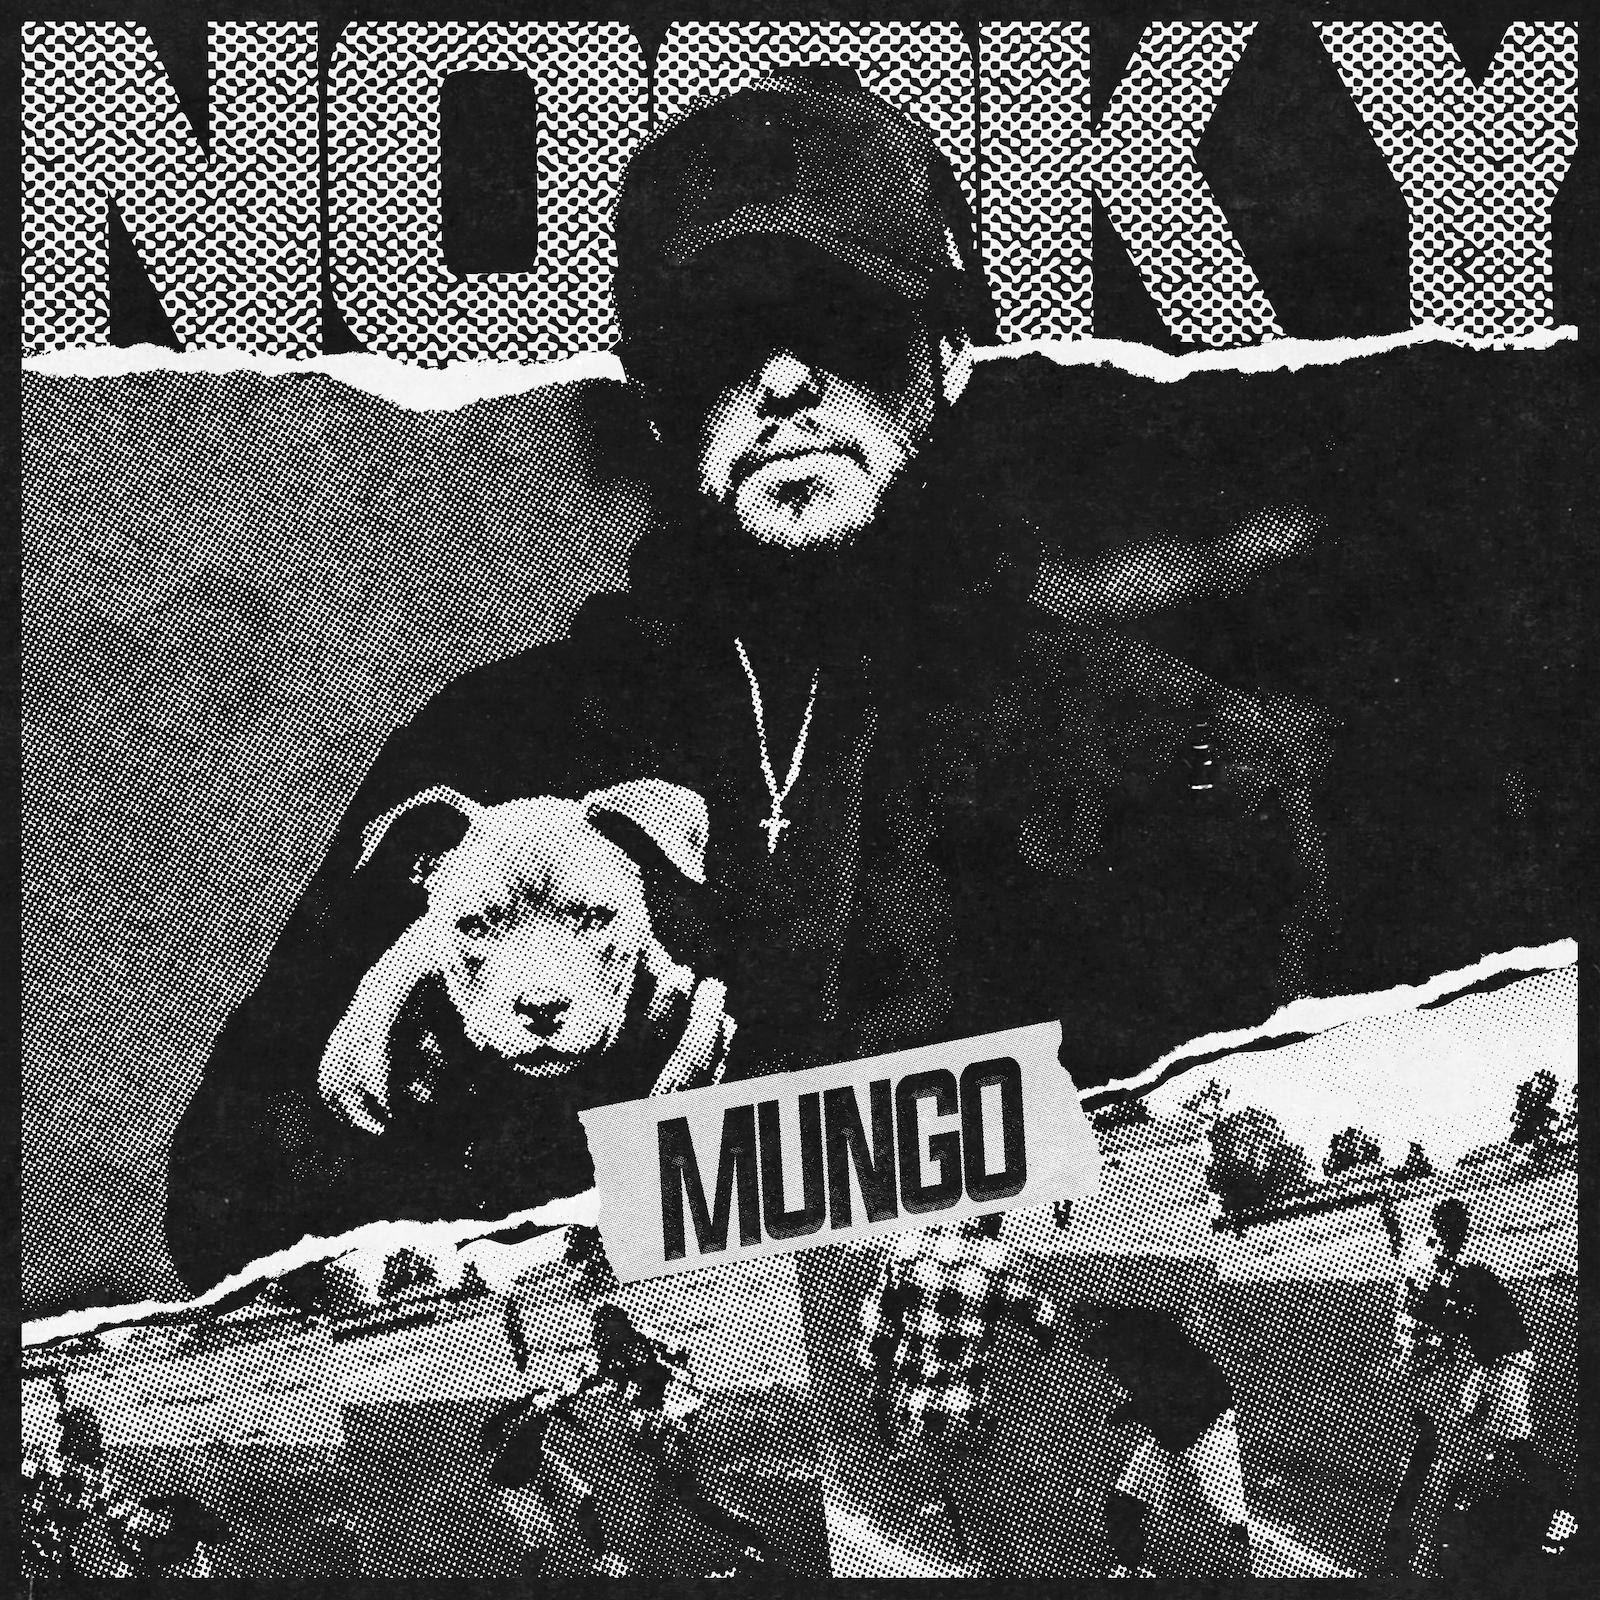 NOOKY 'MUNGO'